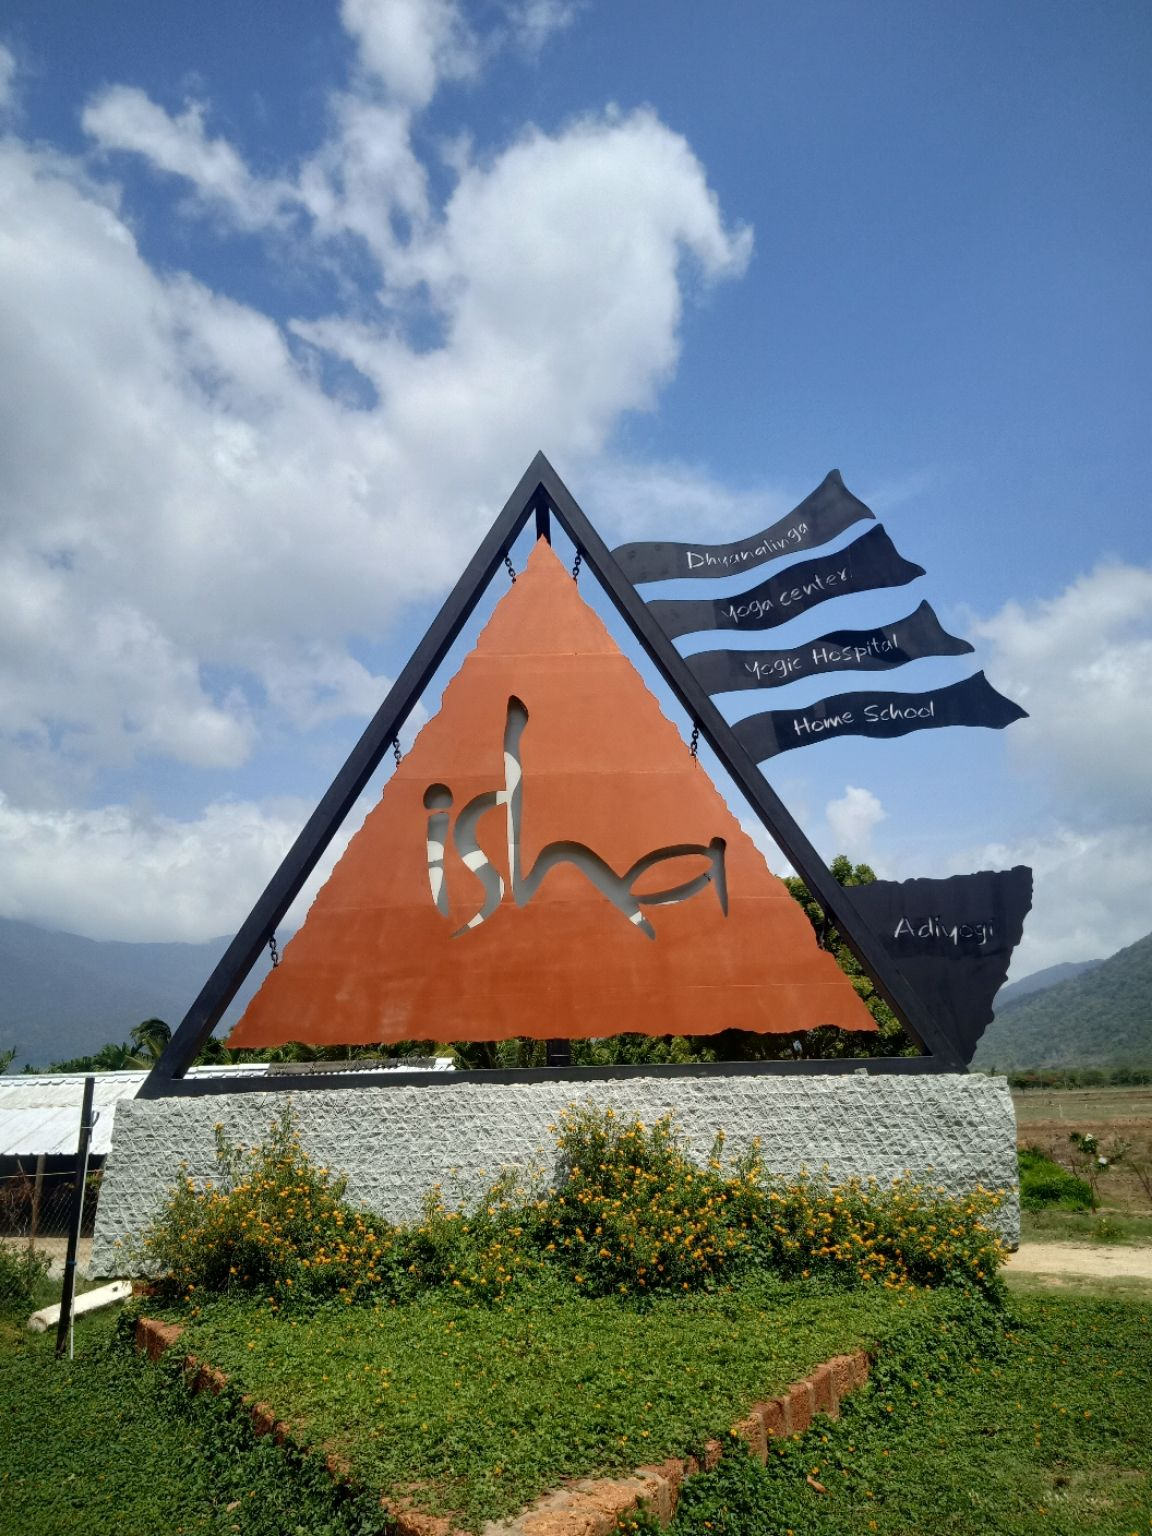 Photo of Isha Yoga Center By Jyothir Adithyan